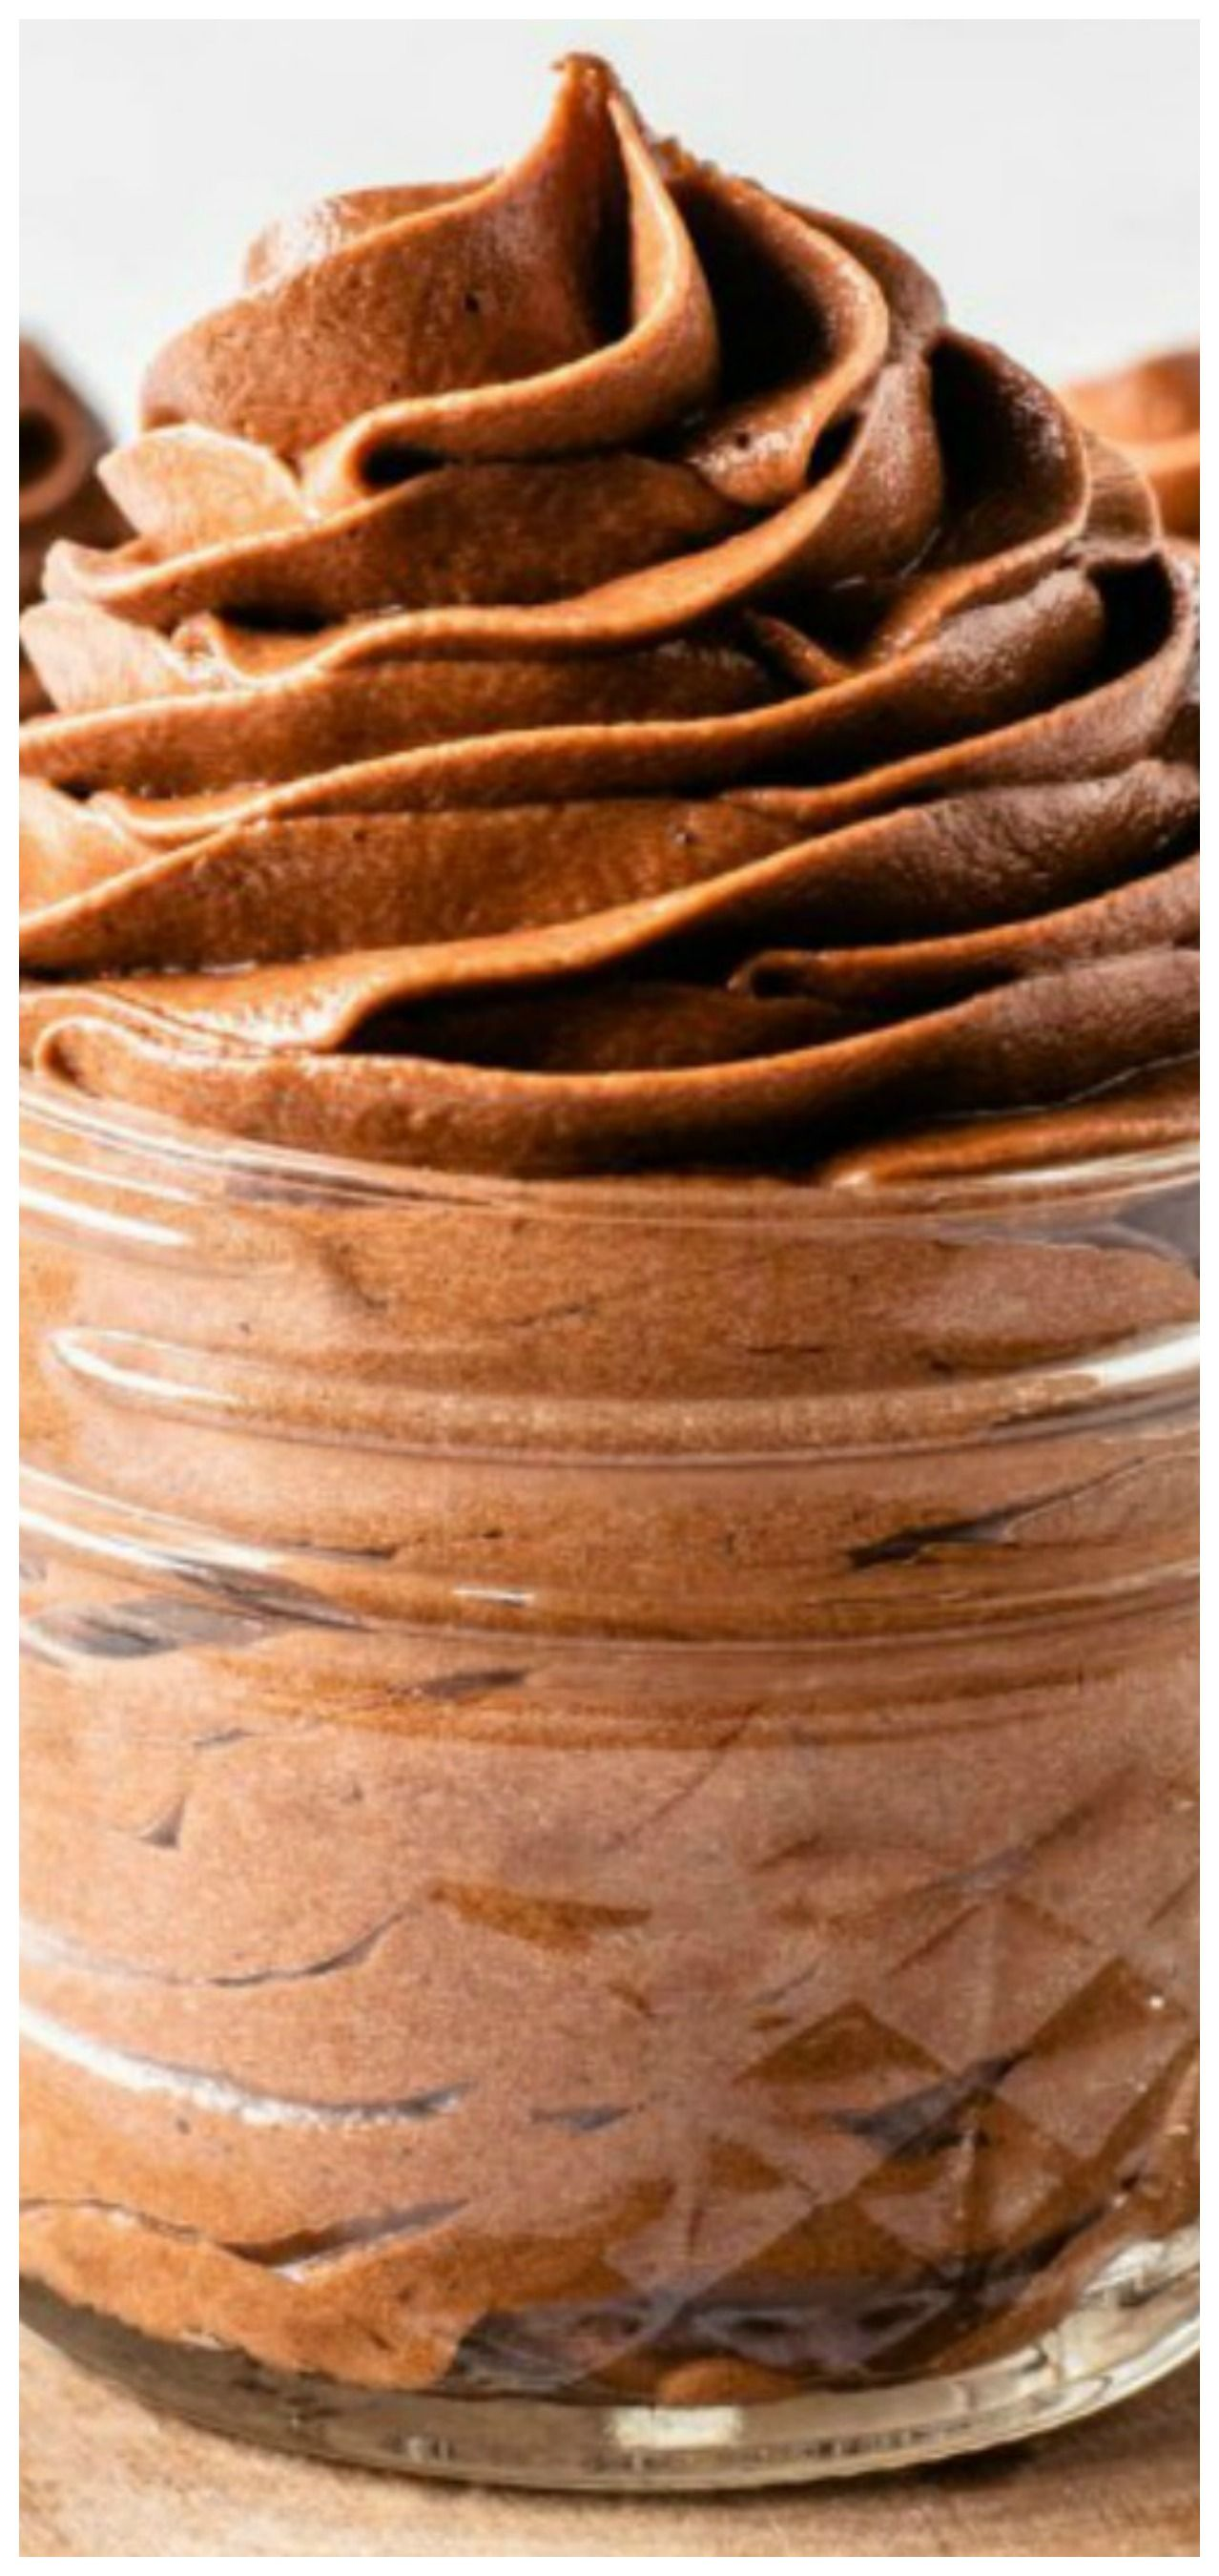 Chocolate Nutella Frosting Recipe Desserts Cupcake Recipes Chocolate Desserts